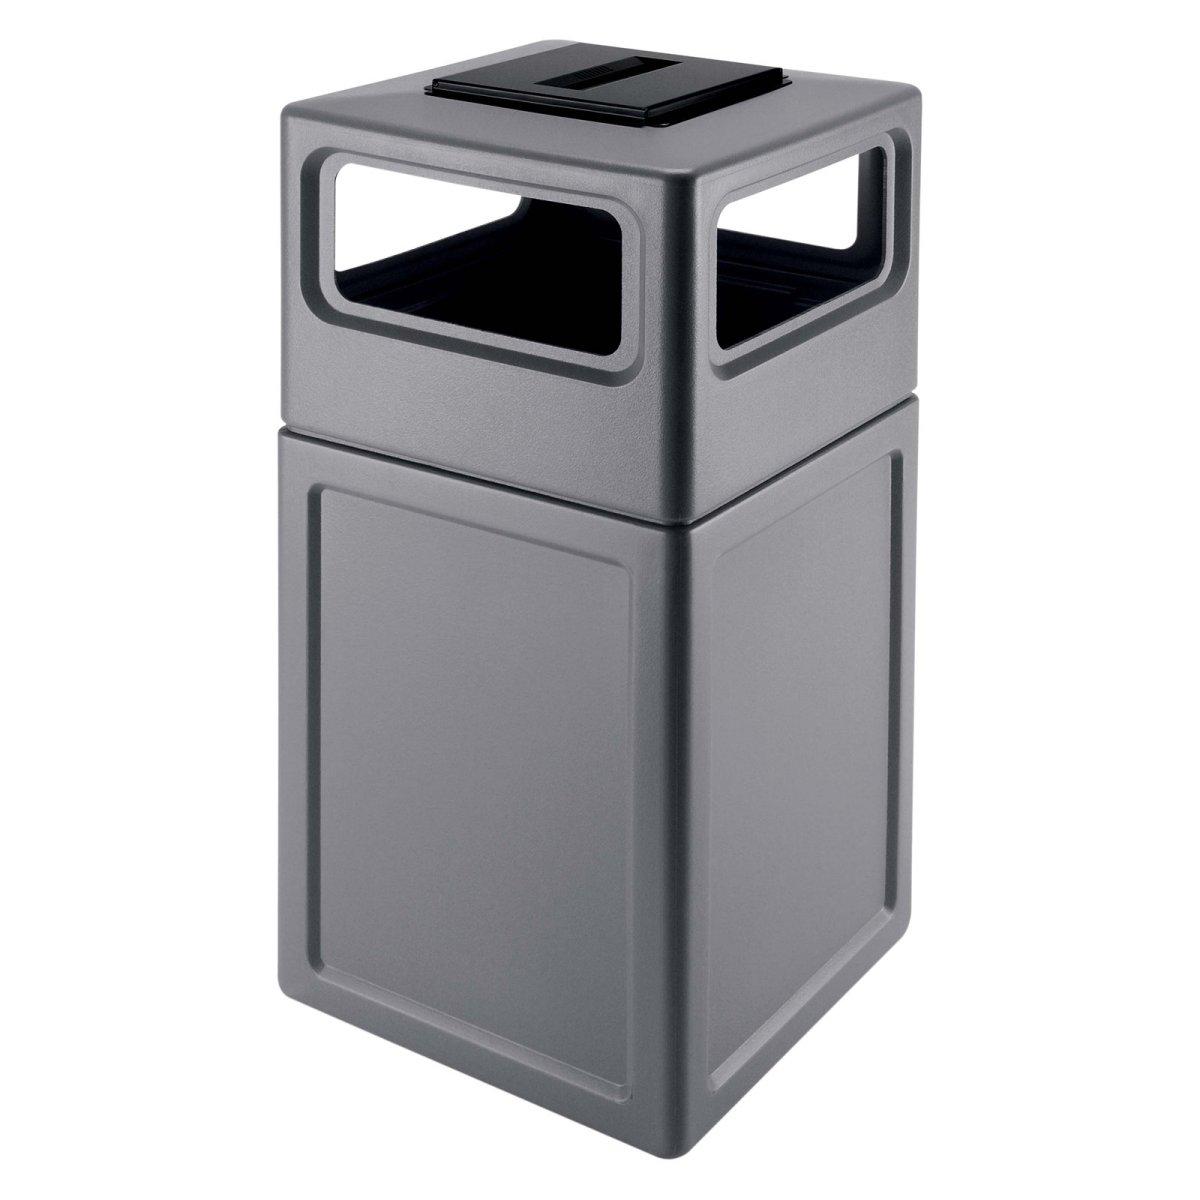 Classroom Trash Can Clipart Classroom Trash Can Clipart